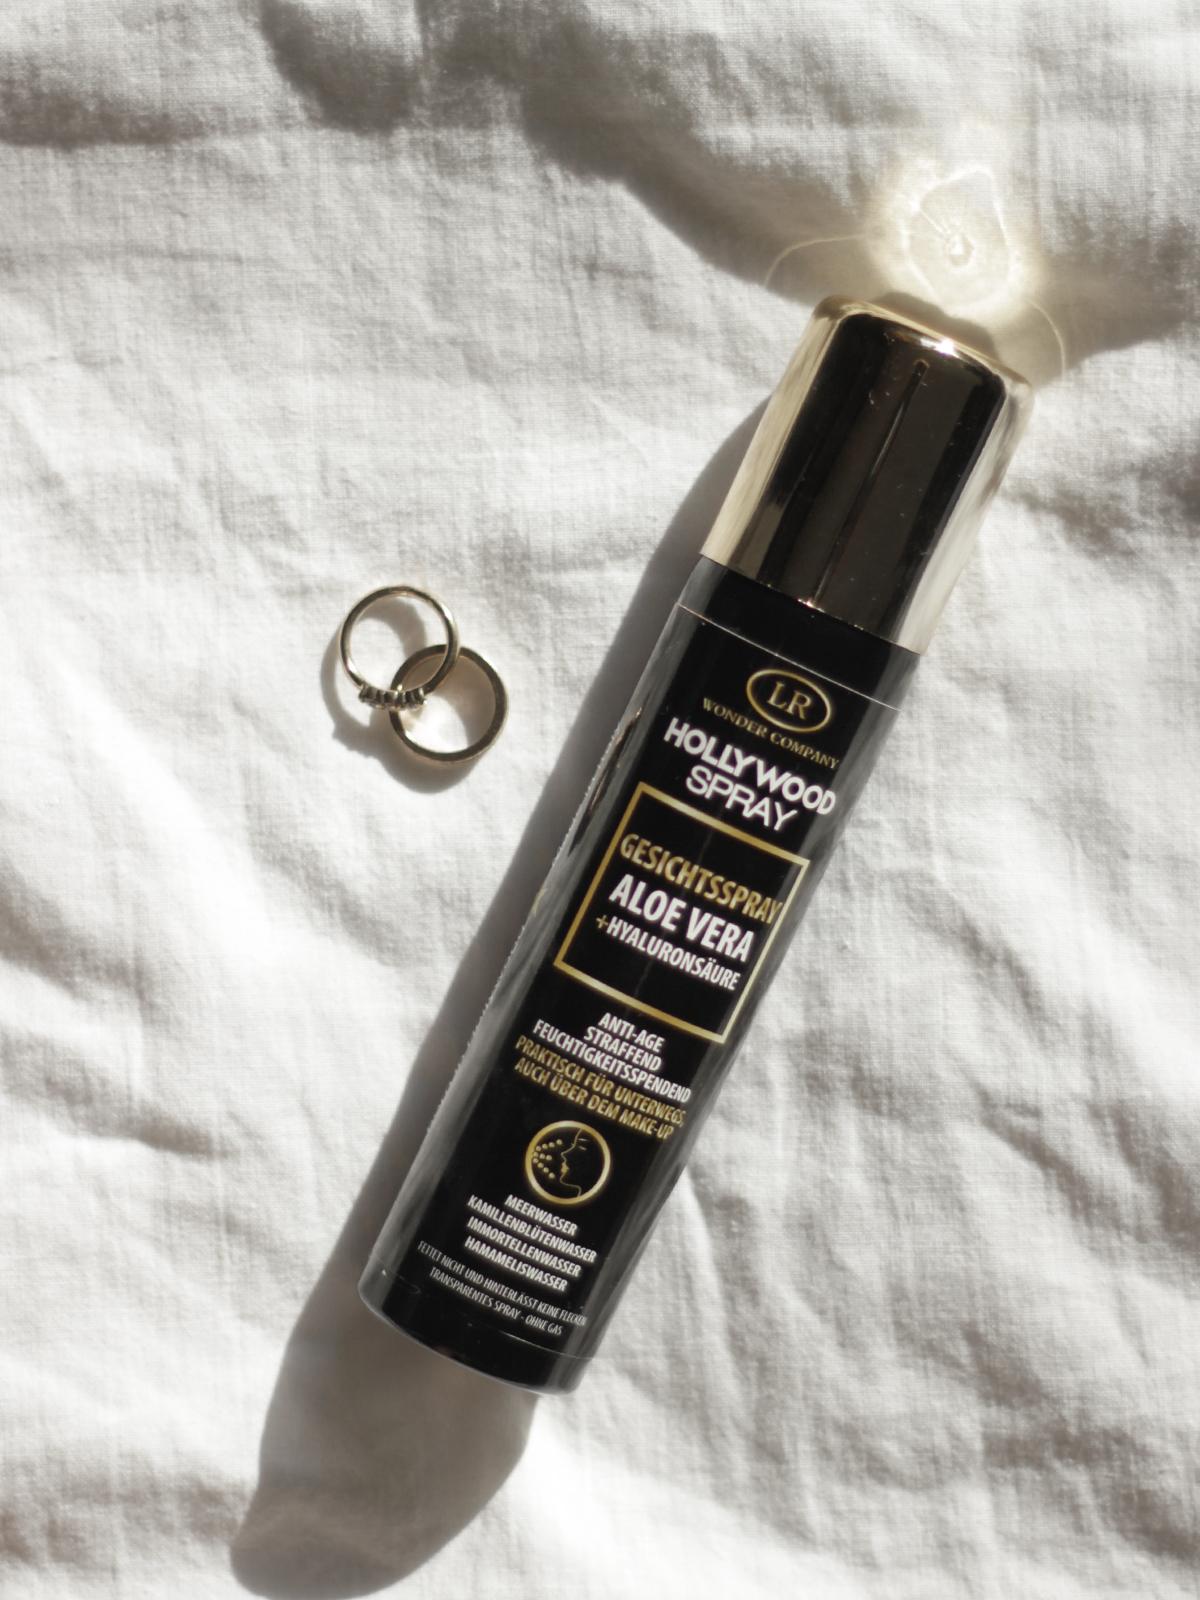 lr-hollywood spray-gesichtsspray-aloe vera